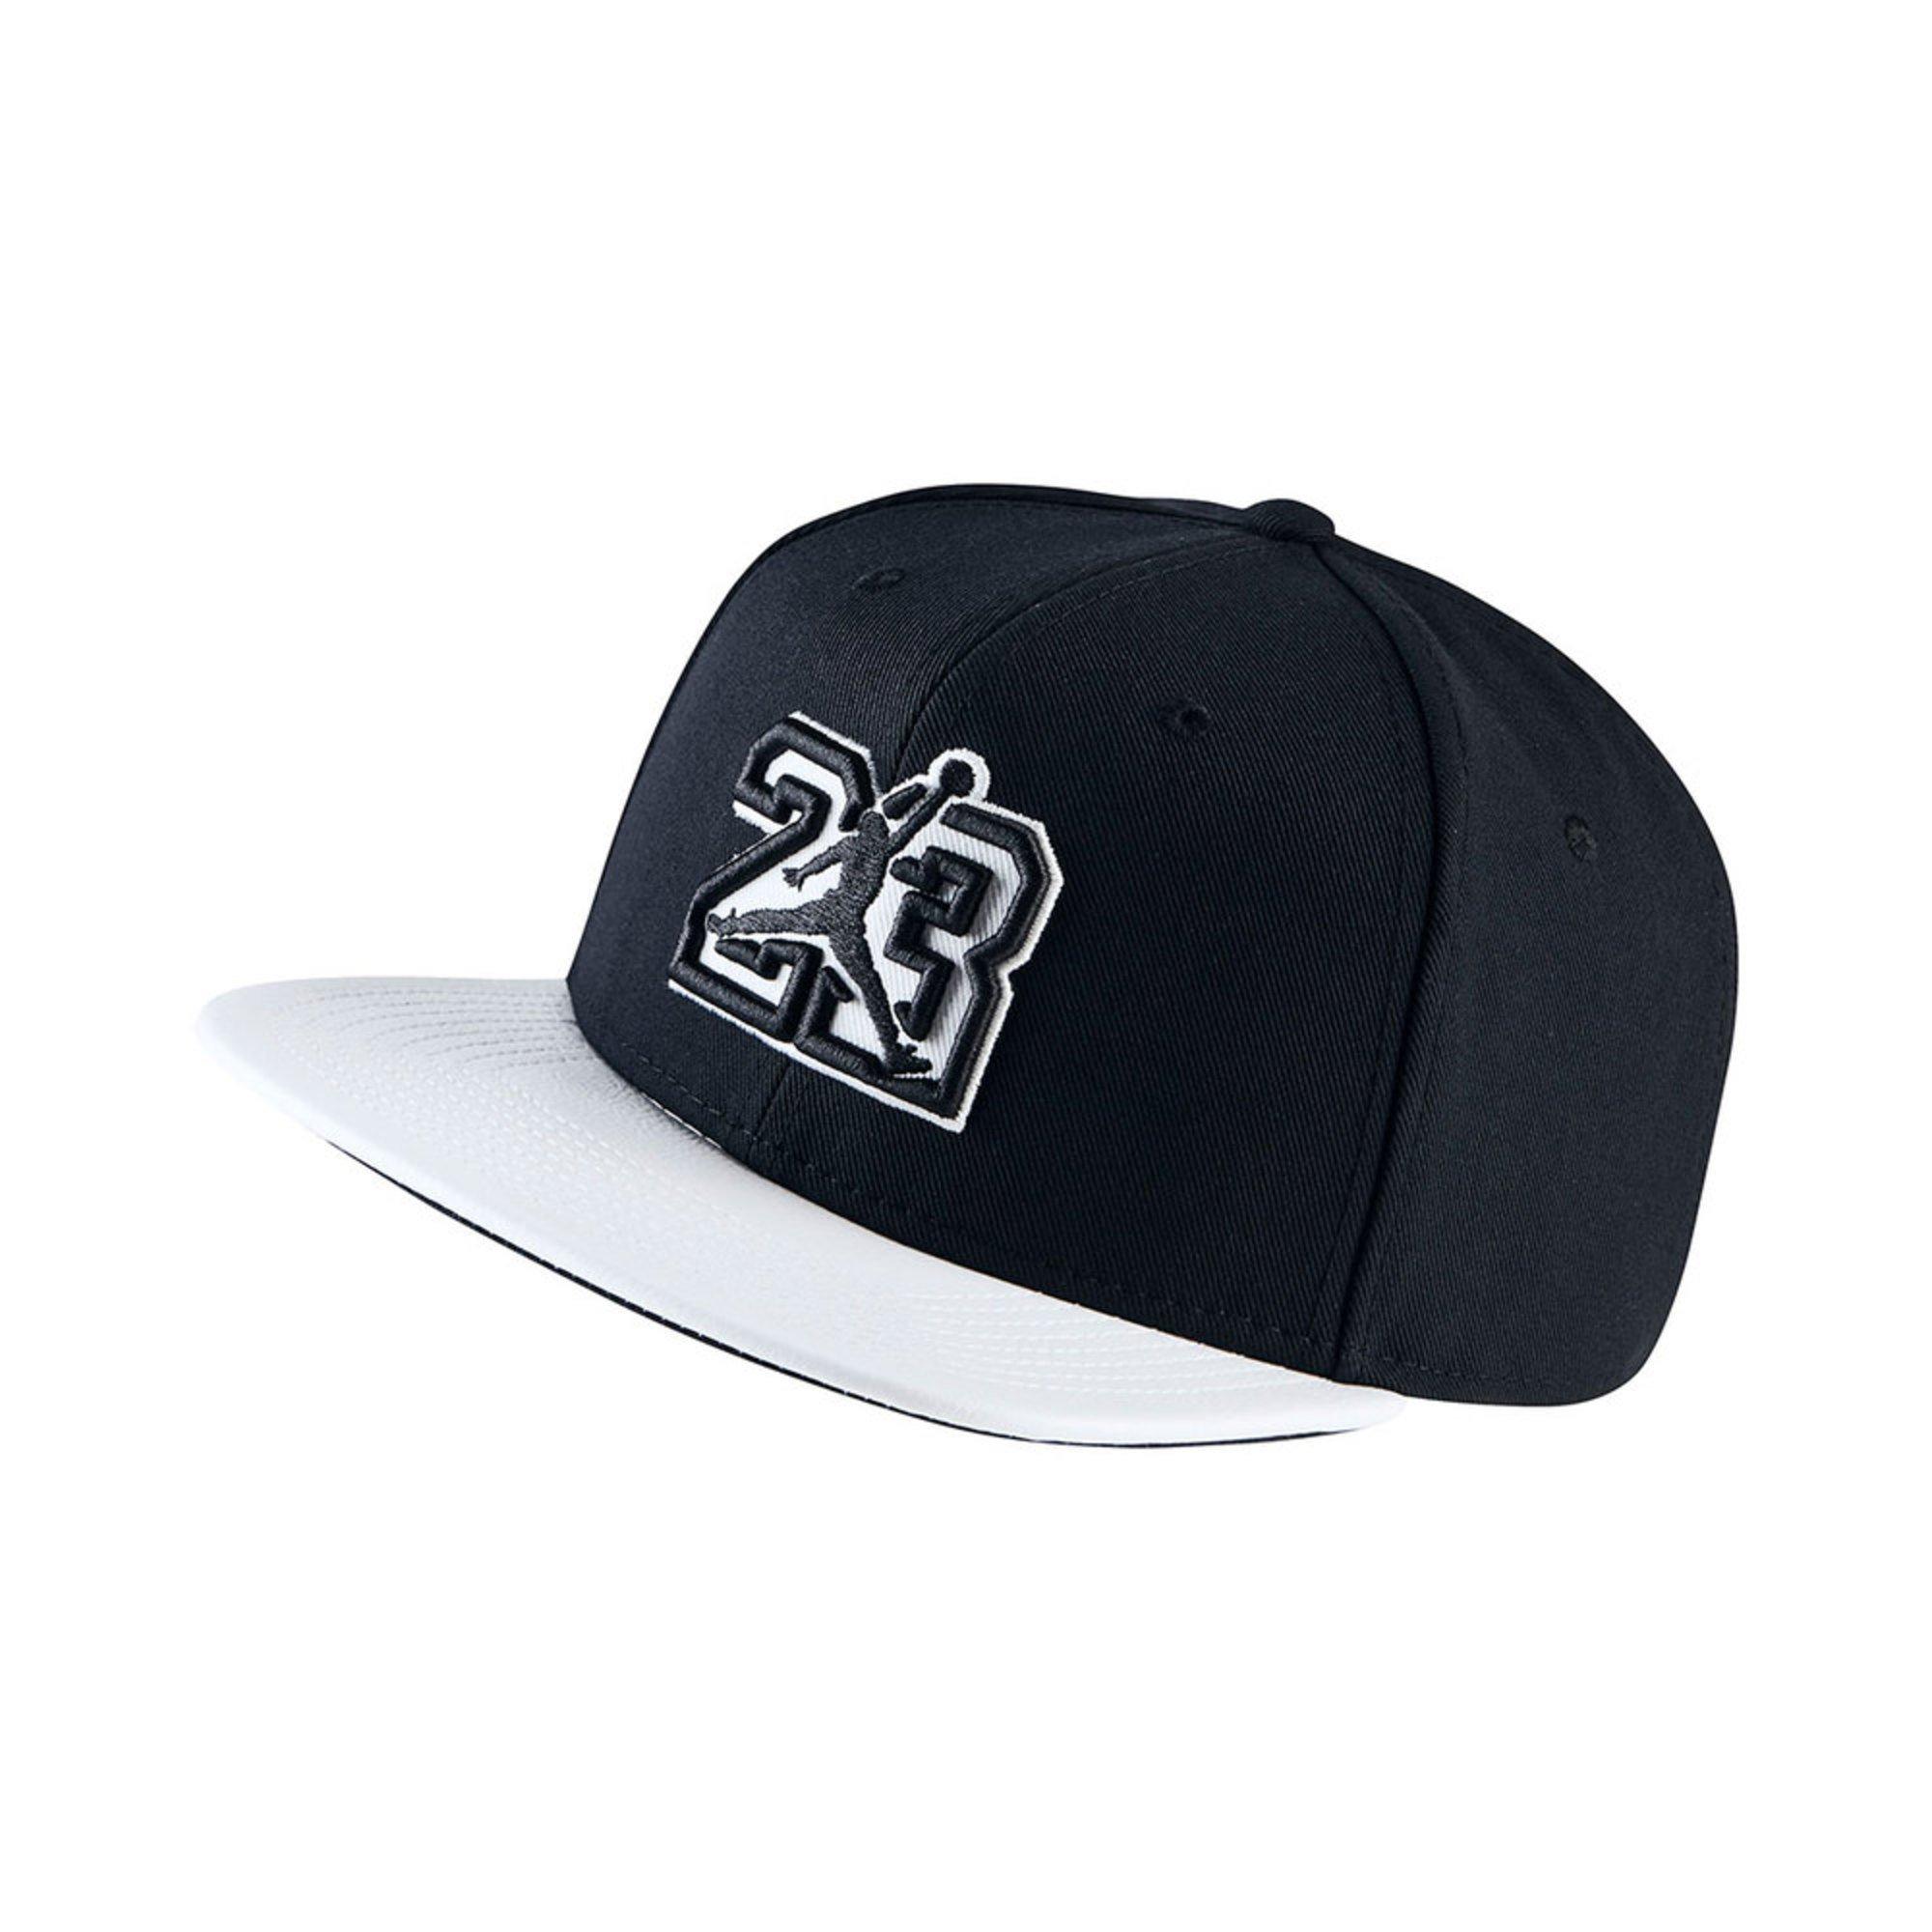 7ae62279dfeb Jordan Men s Pro Hgg Xiii Hat